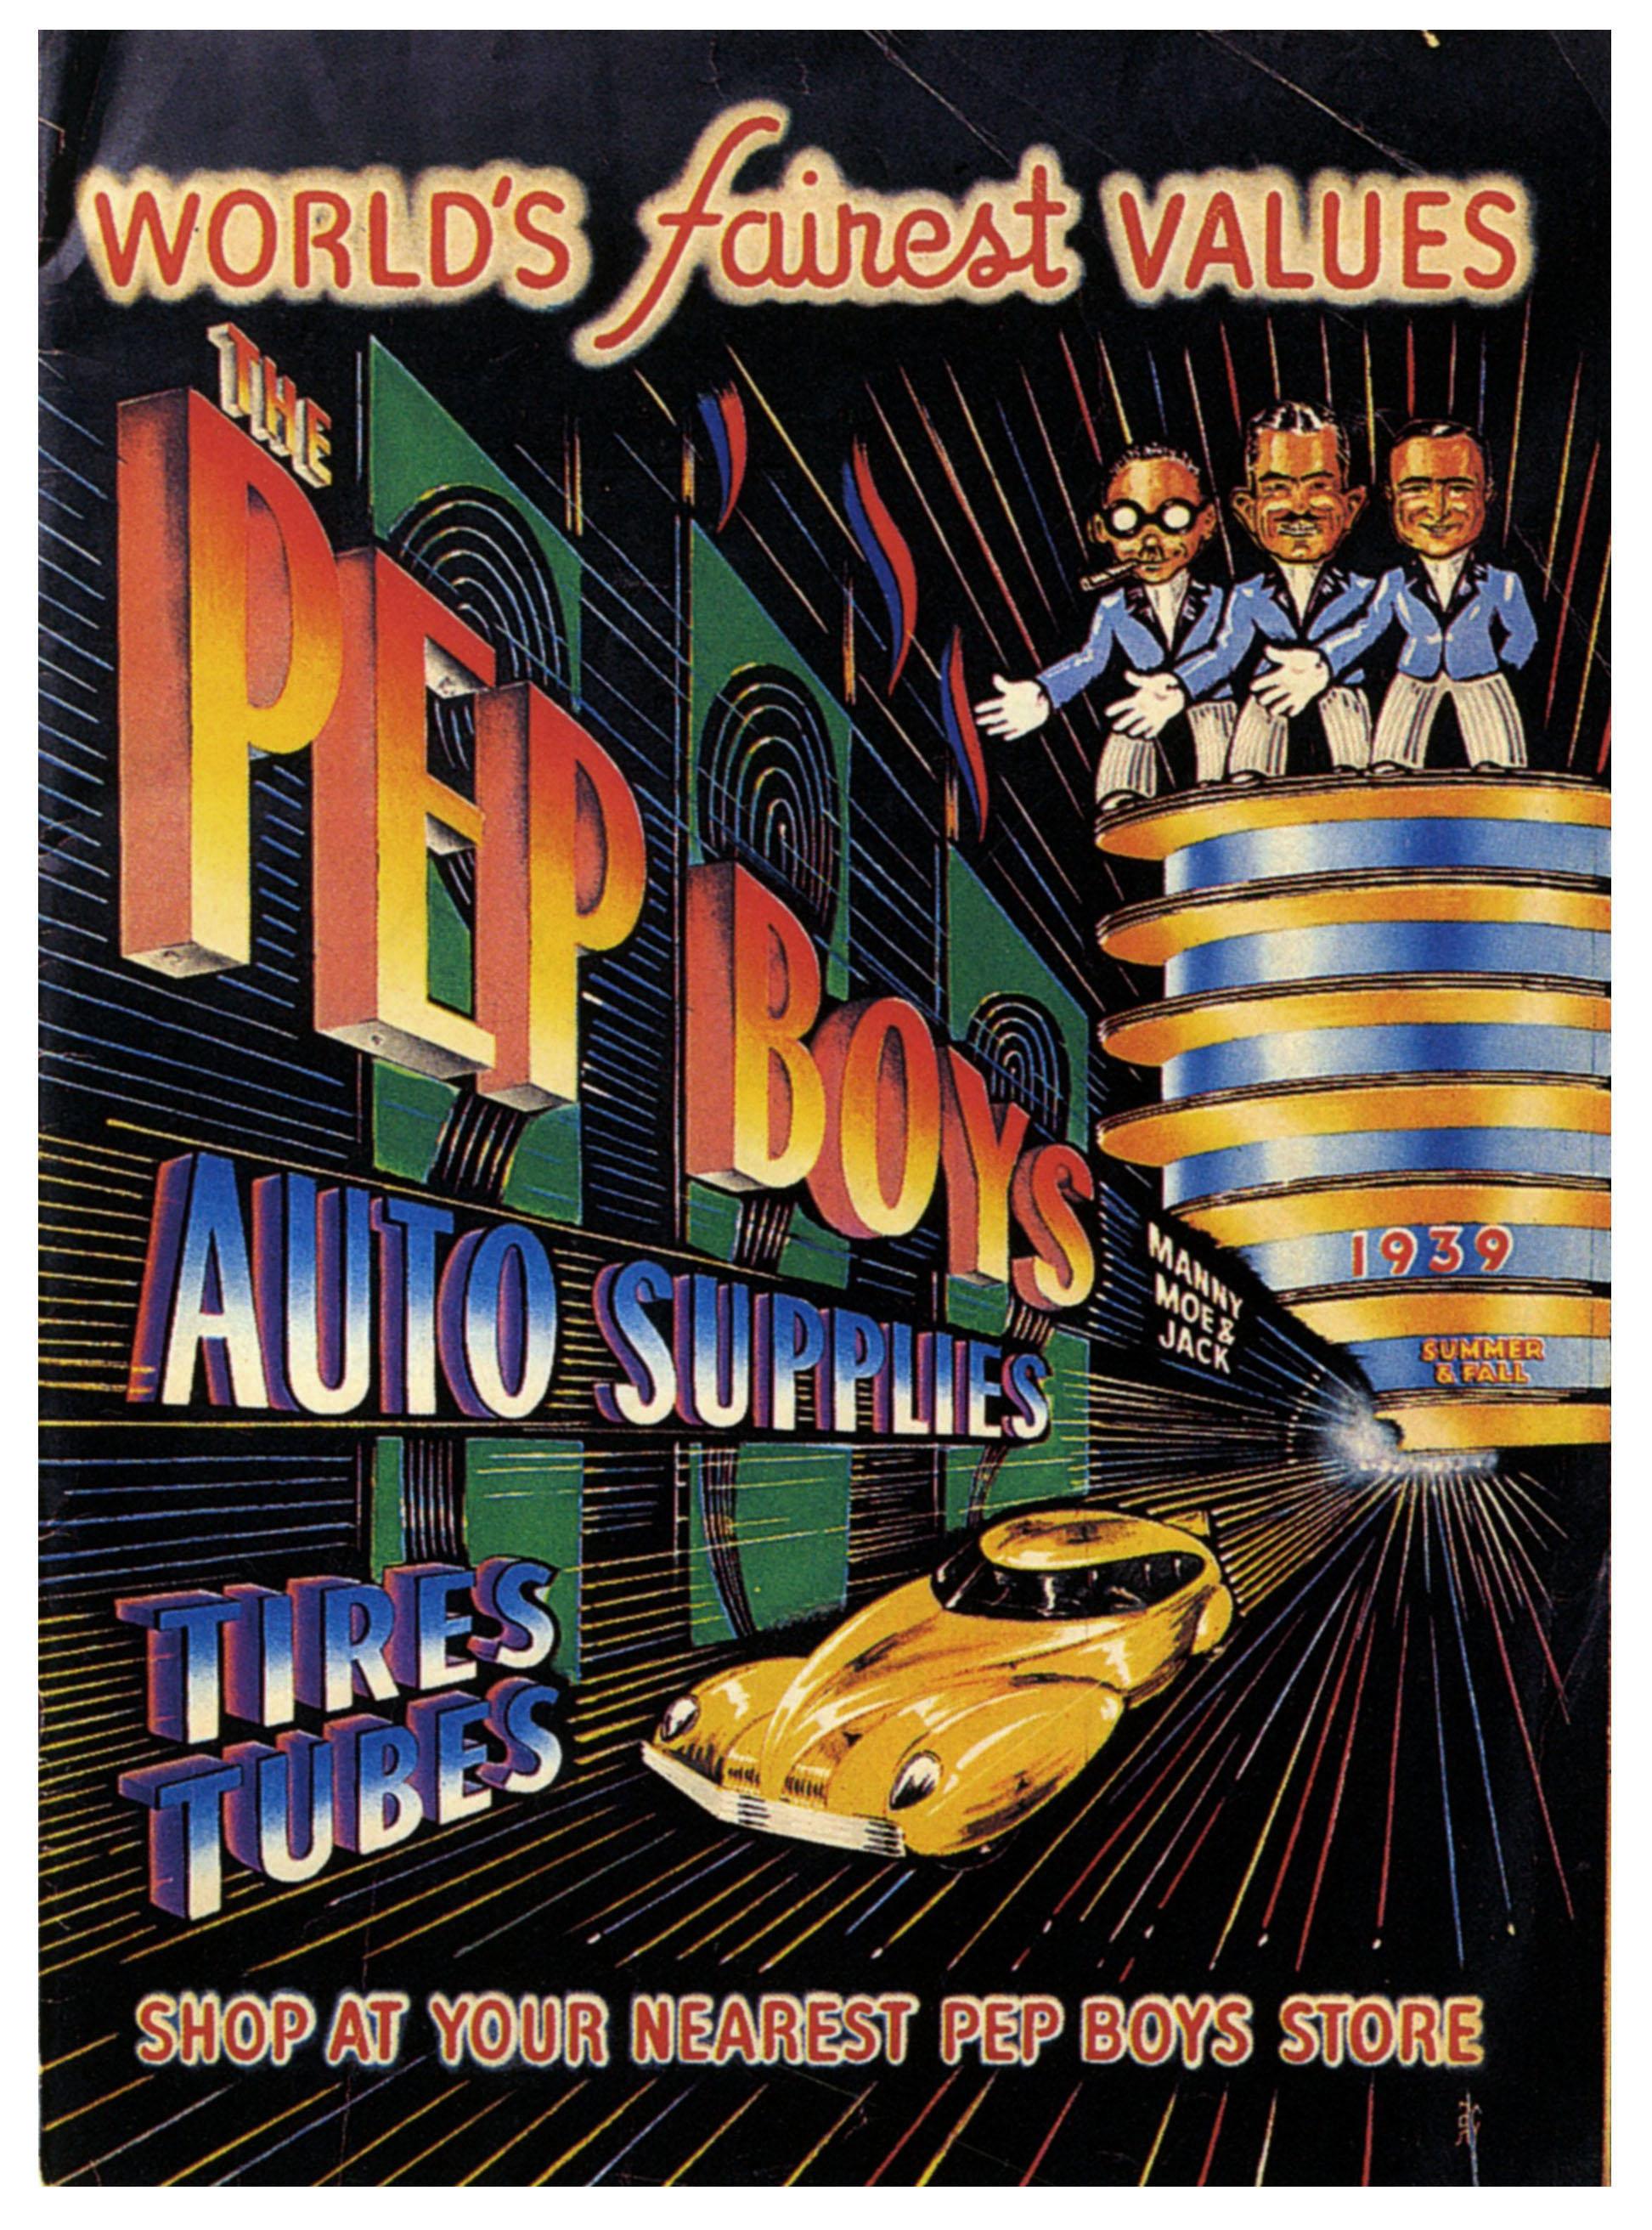 Pep Boys - 1939